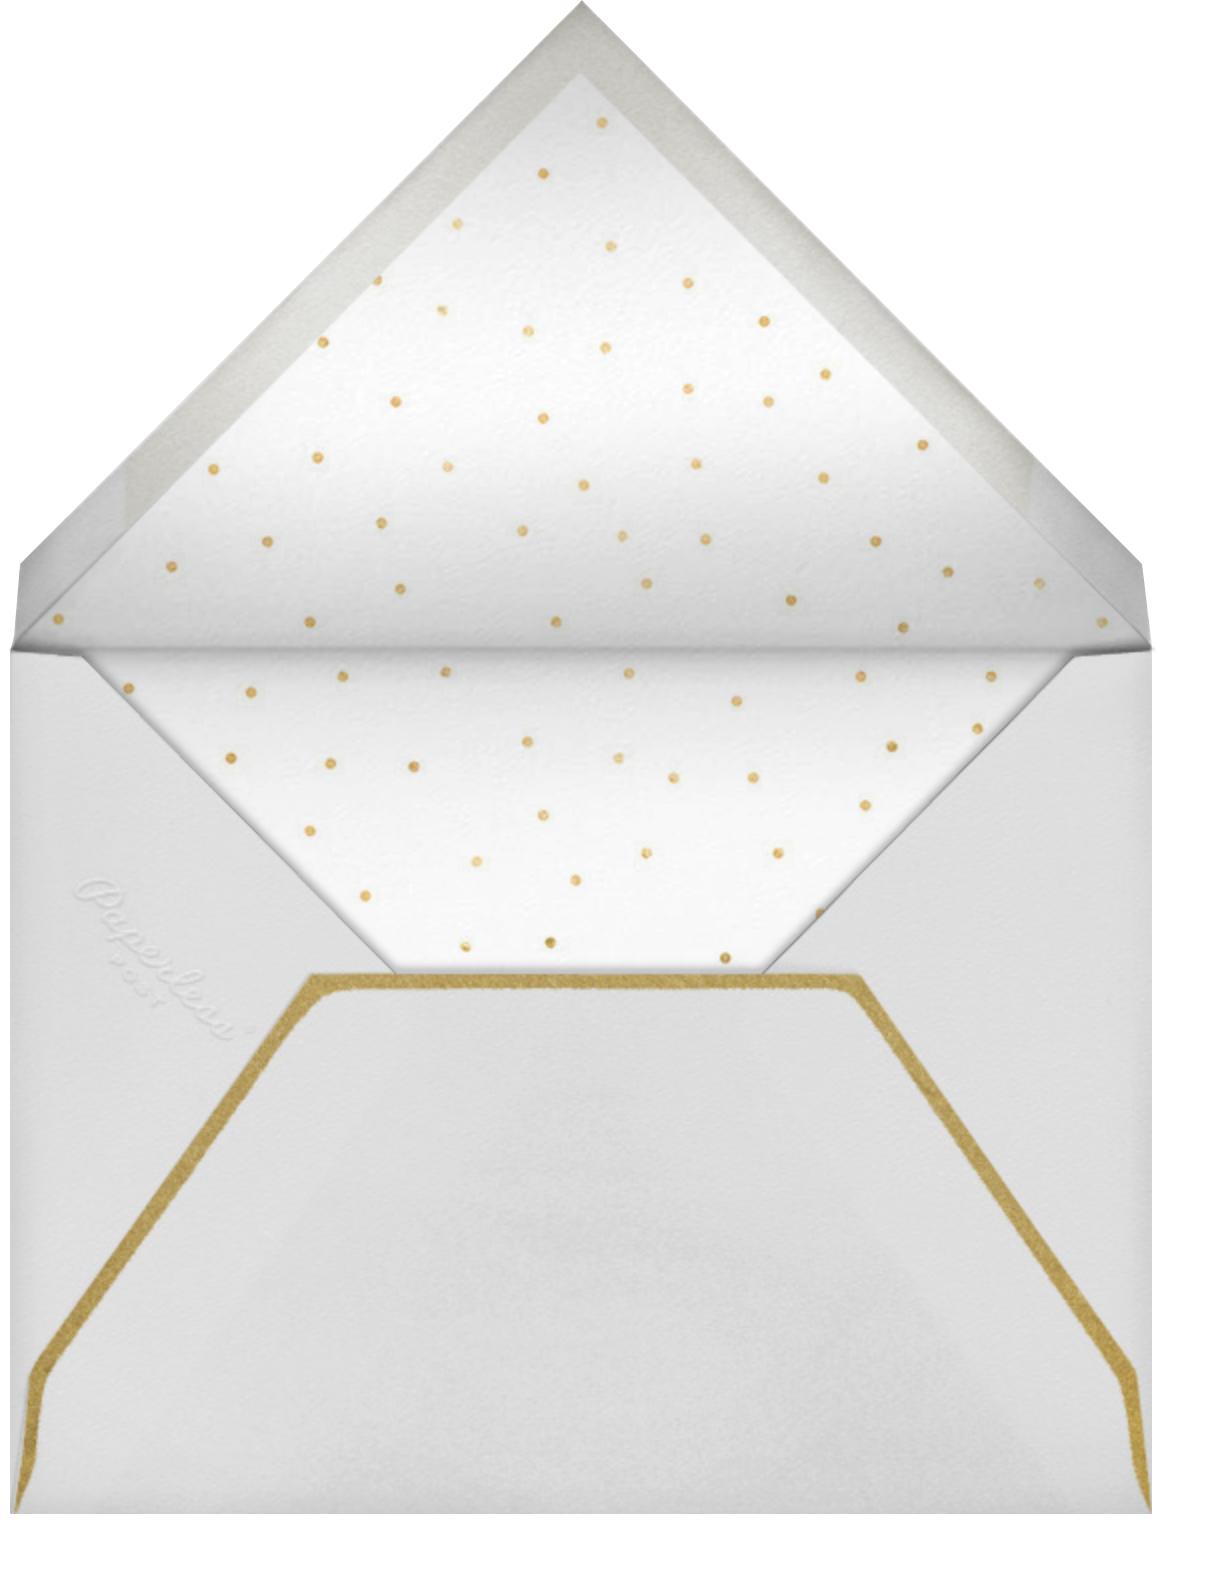 Brushed With Pine - Meri Meri - Christmas baby shower invitations - envelope back